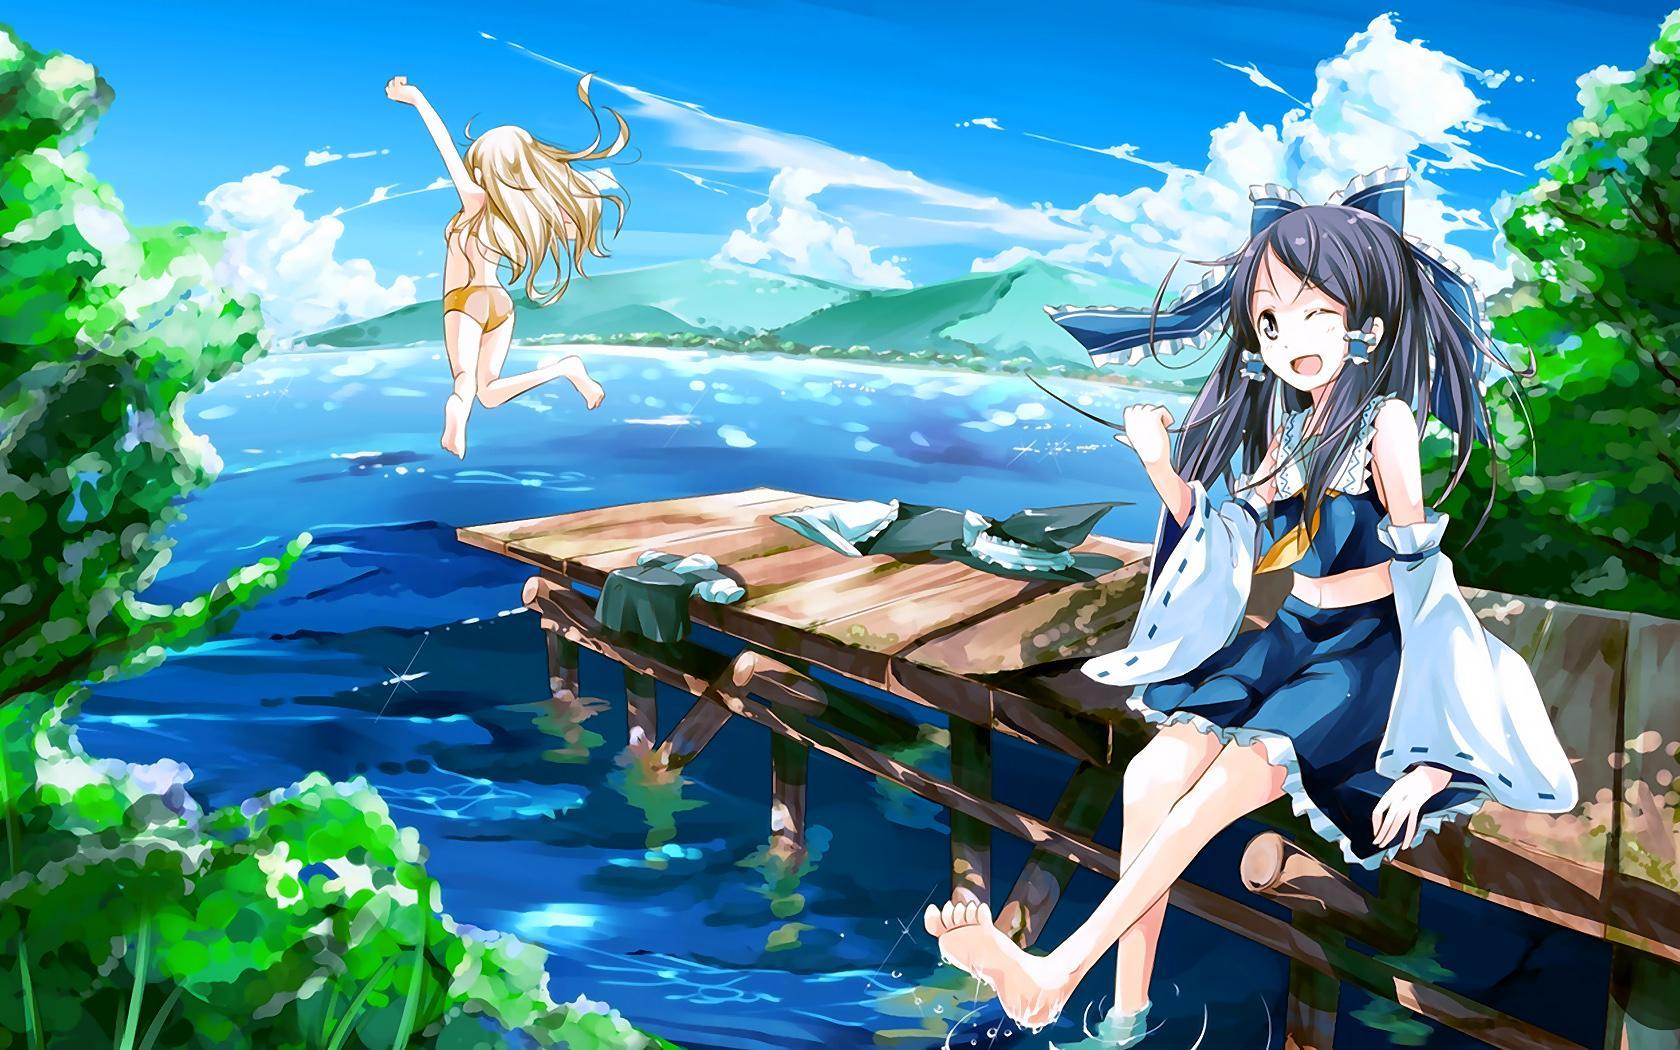 In summer hd wallpaper download cartoon wallpaper html code - Free Download Anime Summer Fun Girls In Bikini Wallpaper In High